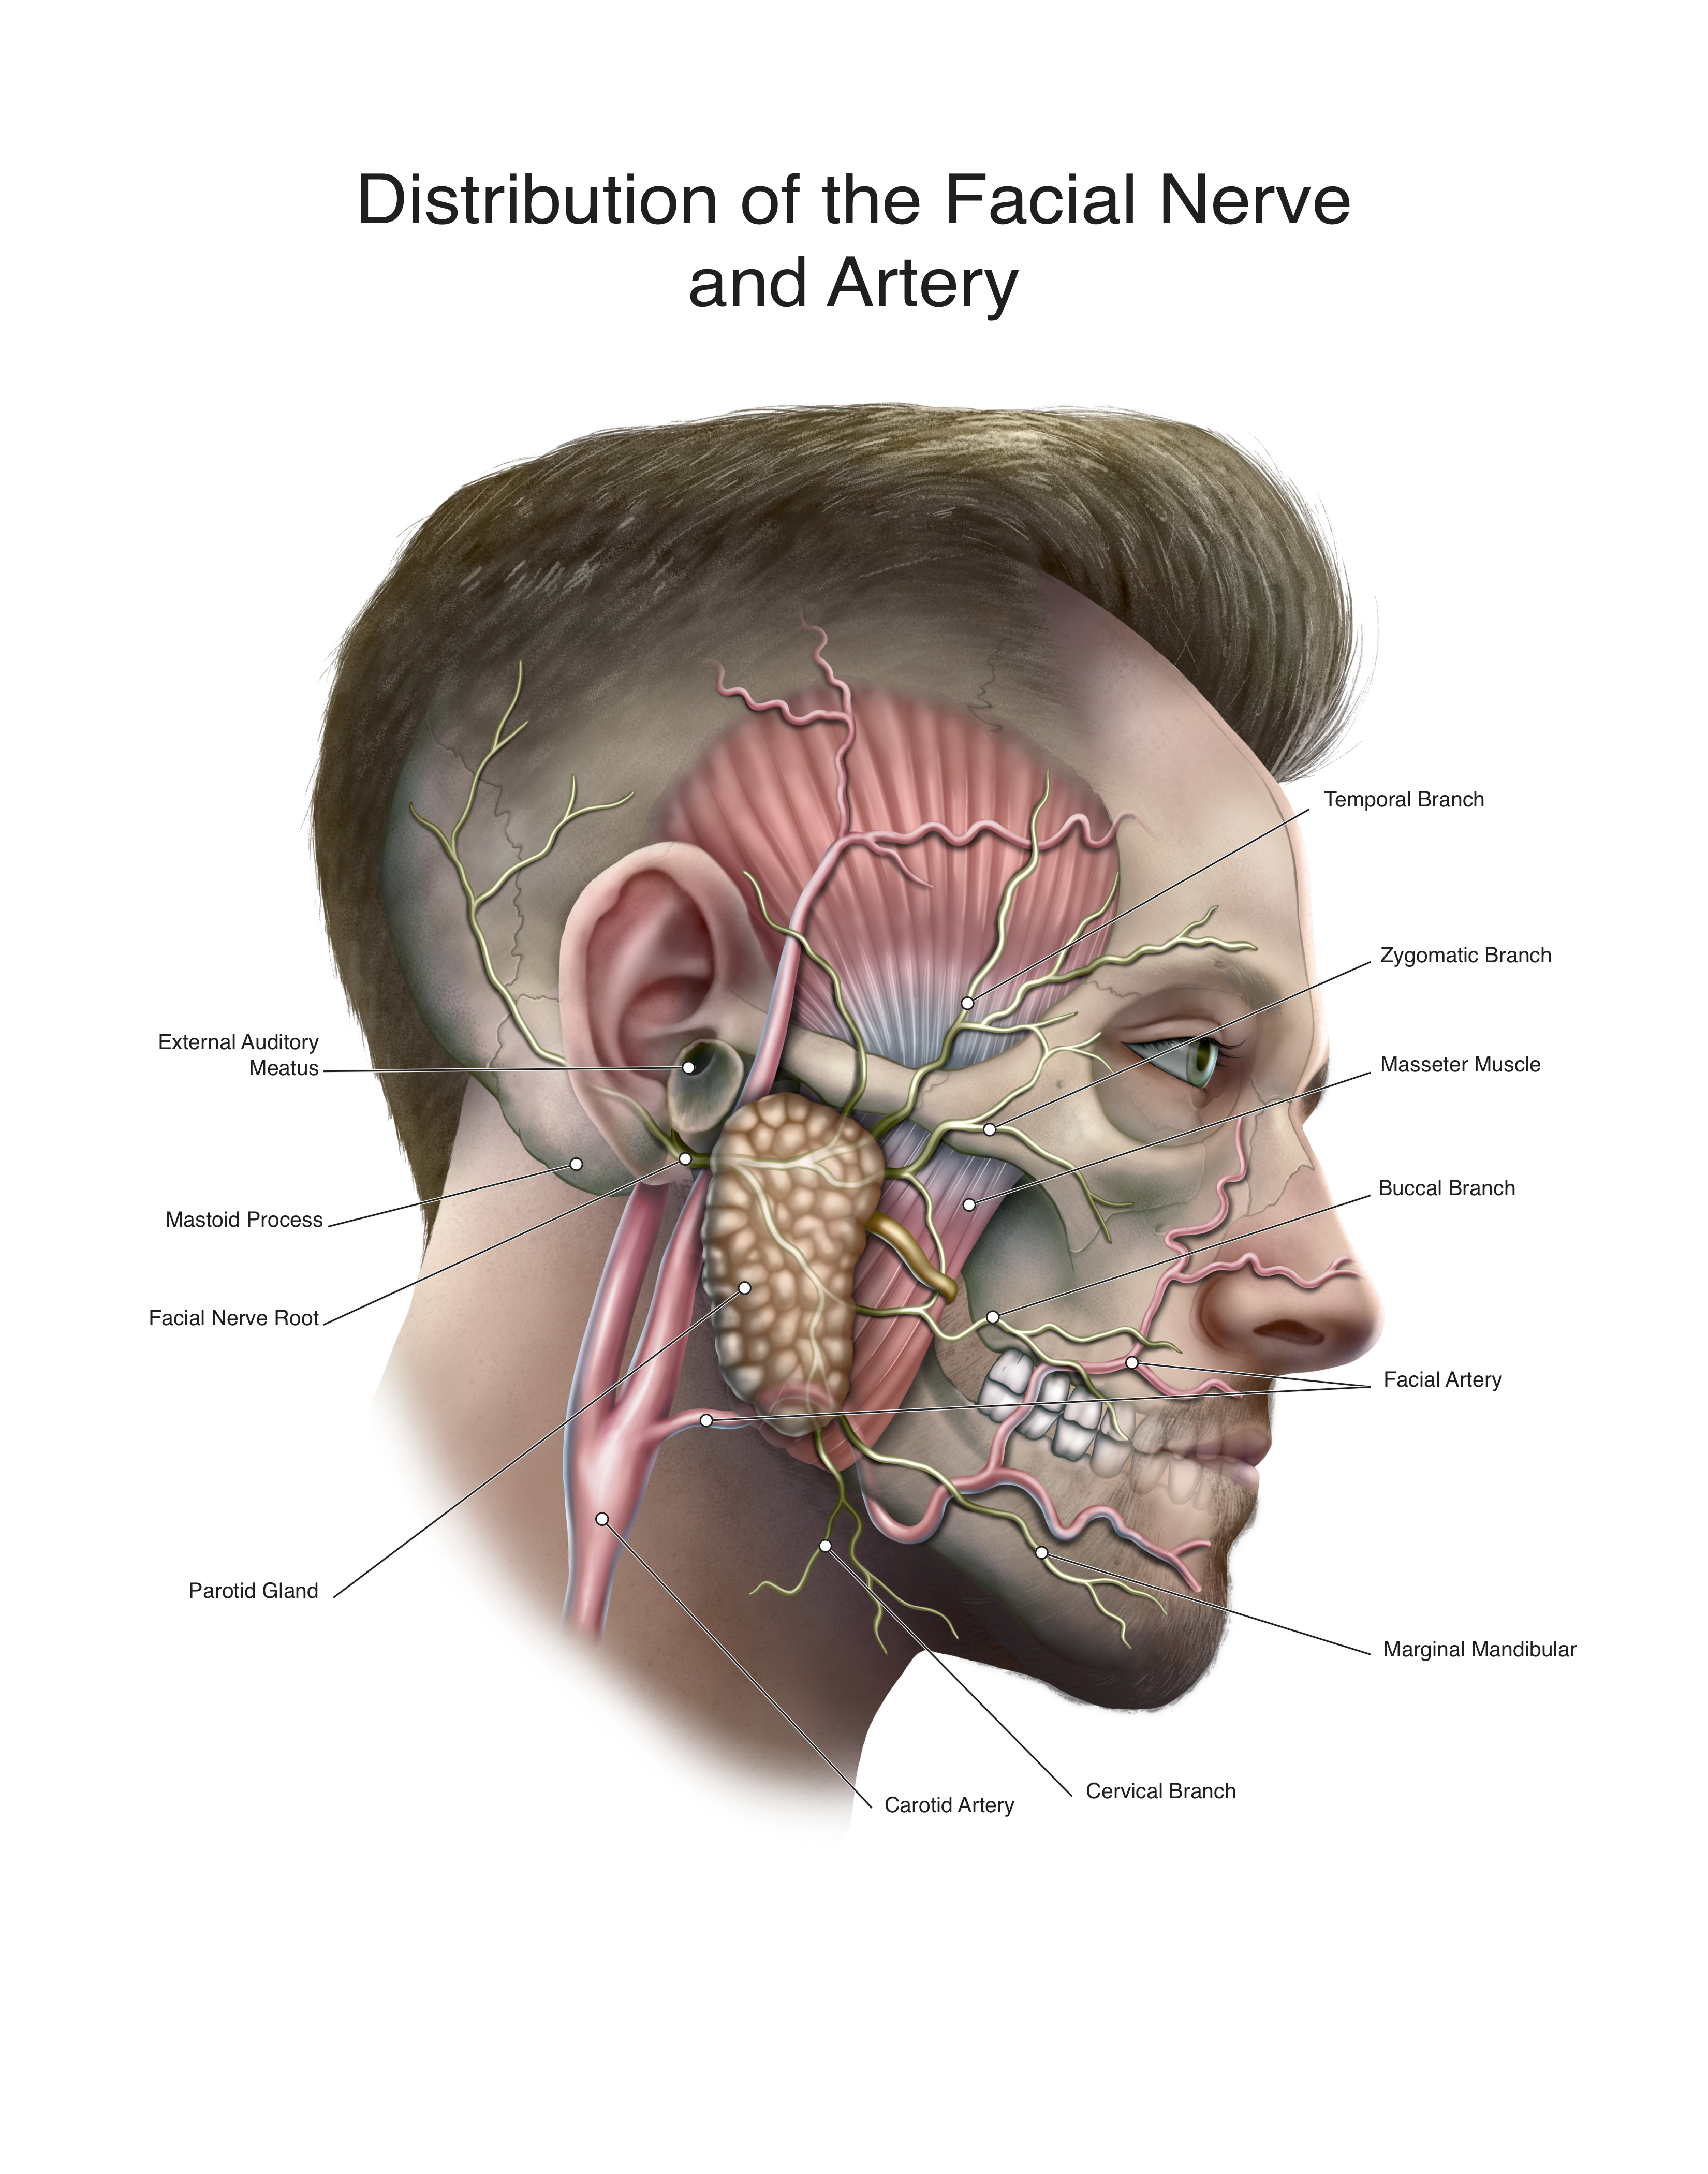 facial-nerve-reconstructiontures